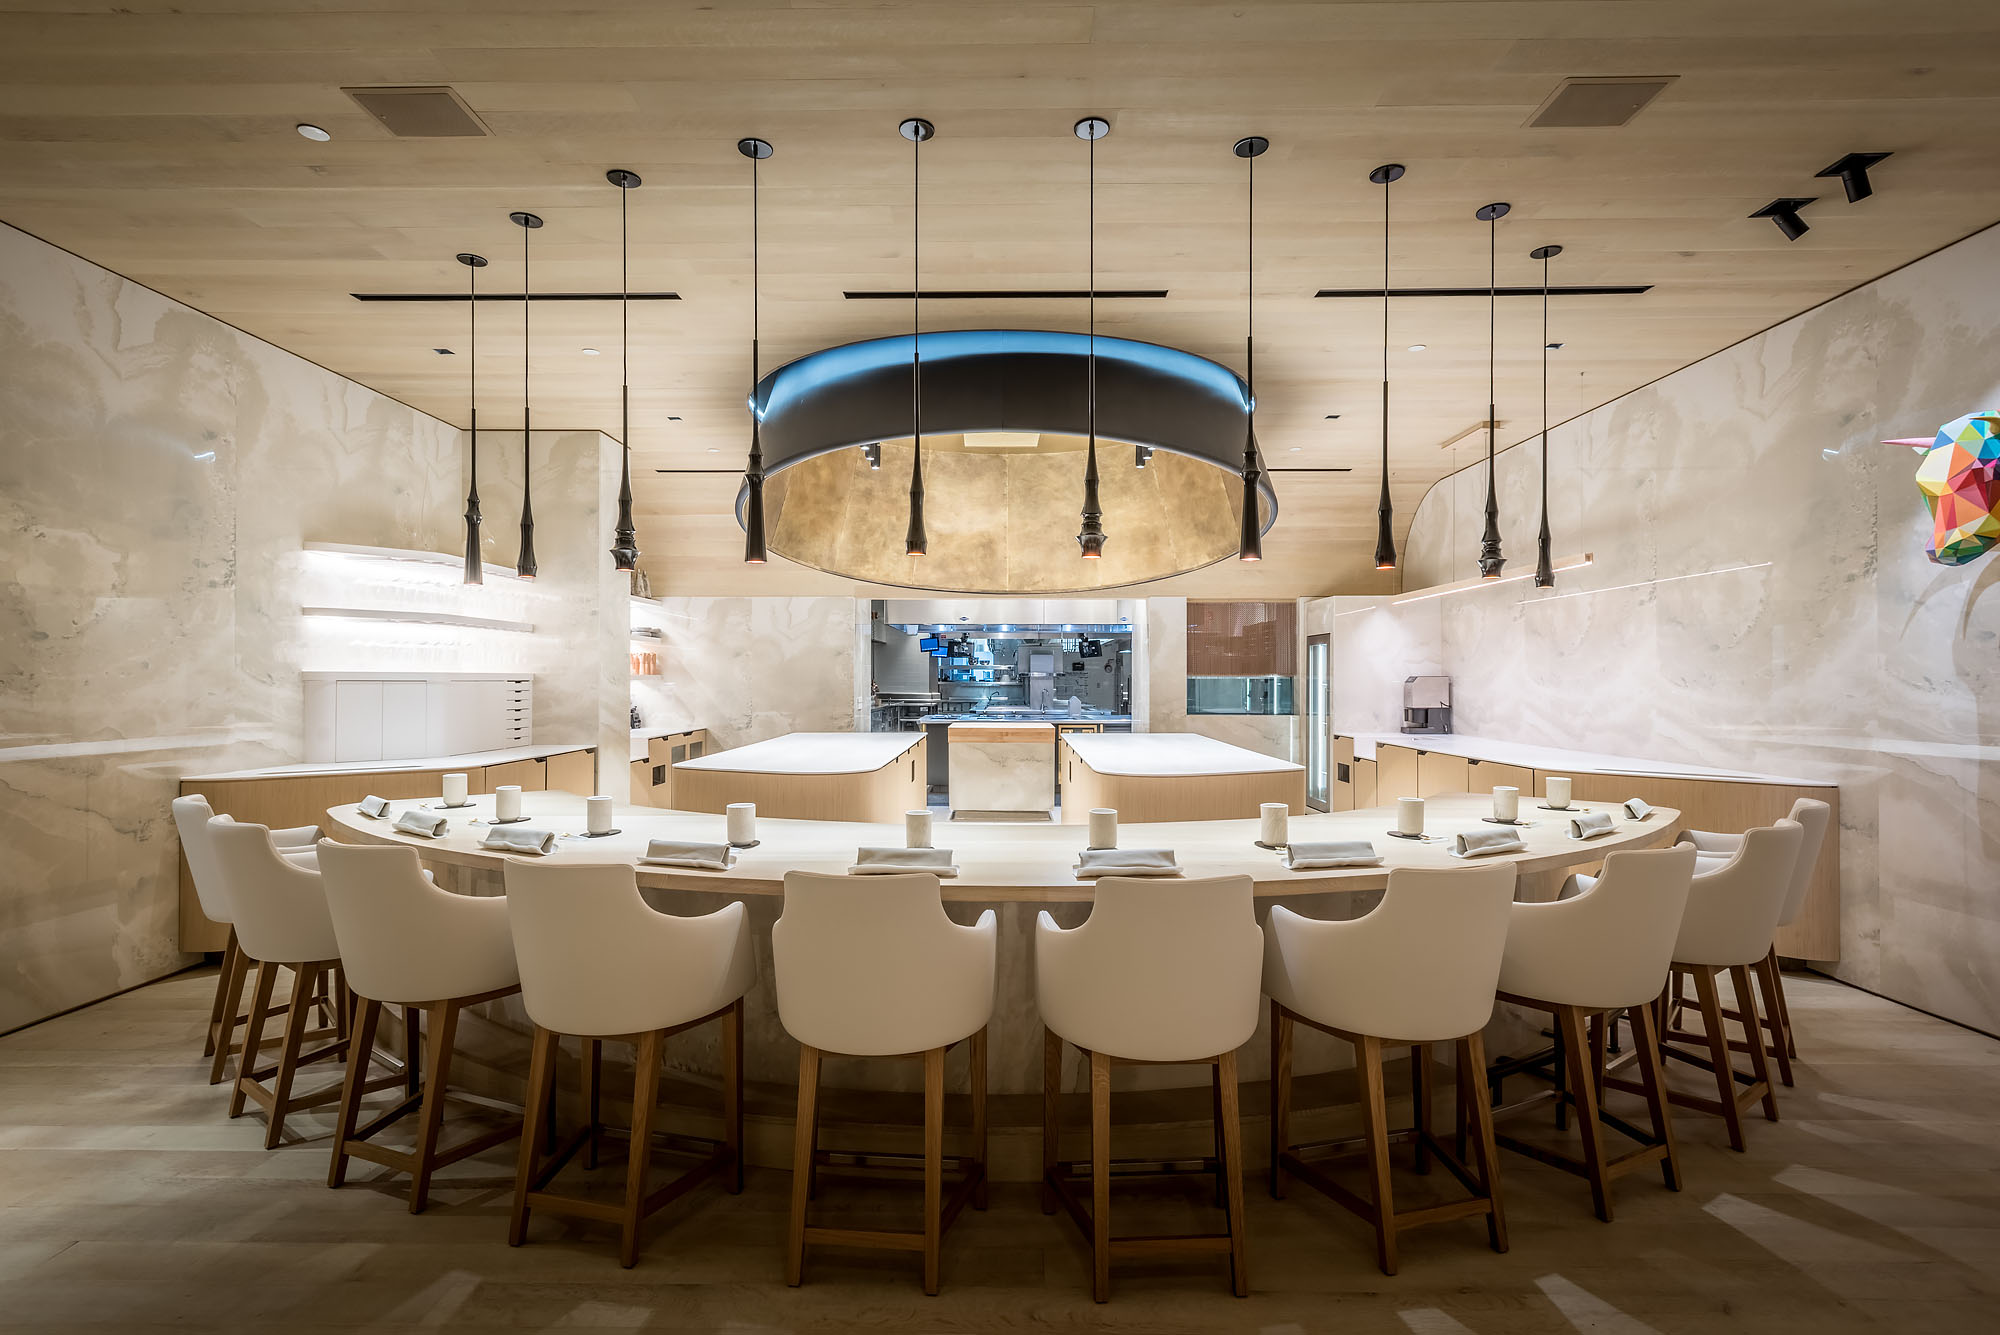 Here Are LA's New Michelin Star Restaurants for 2019